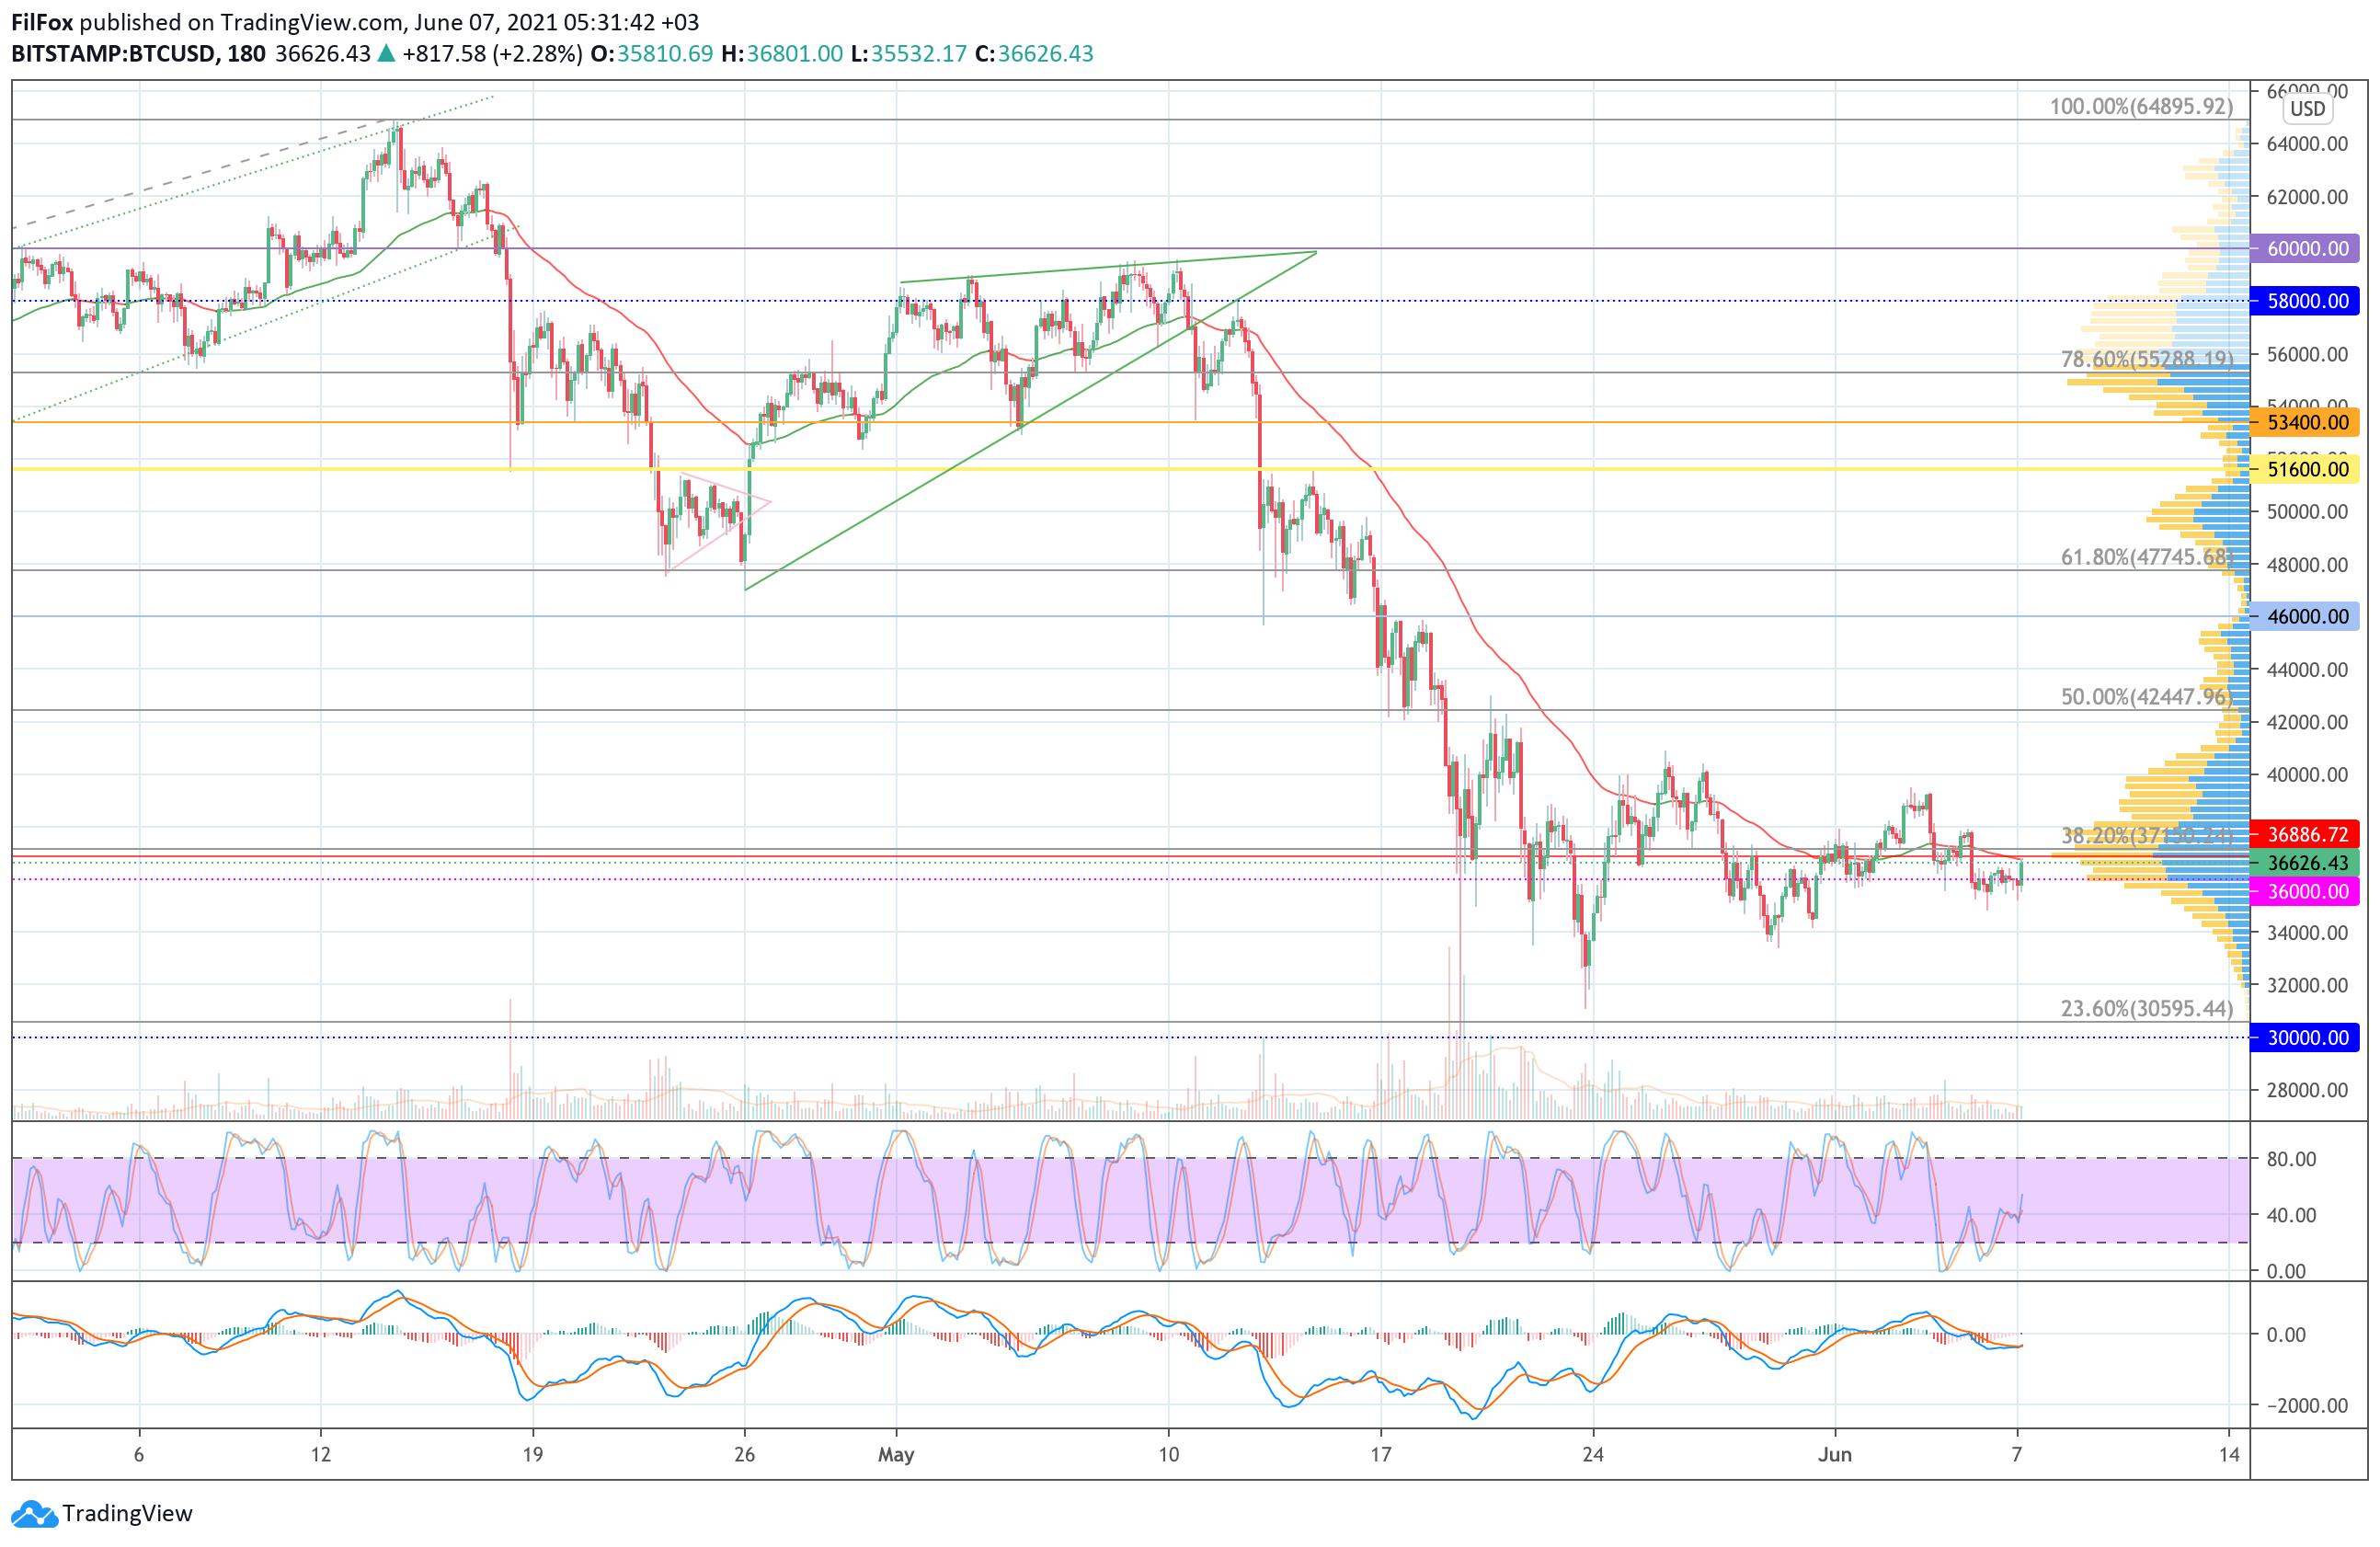 Анализ цен Bitcoin, Ethereum, XRP на 07.06.2021